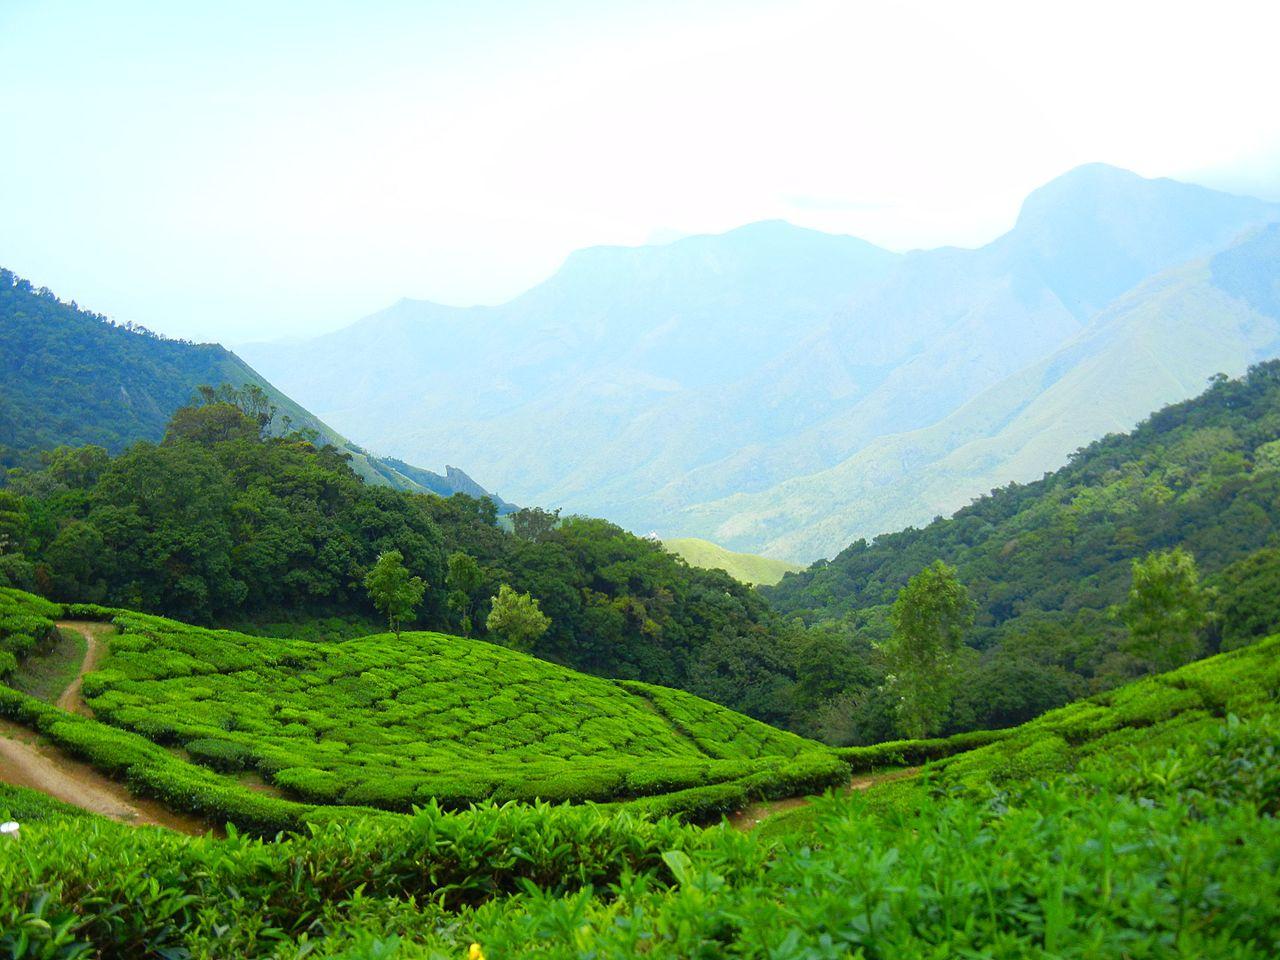 FileThe Kanan Devan Hills Tea estates of Munnar Kerala